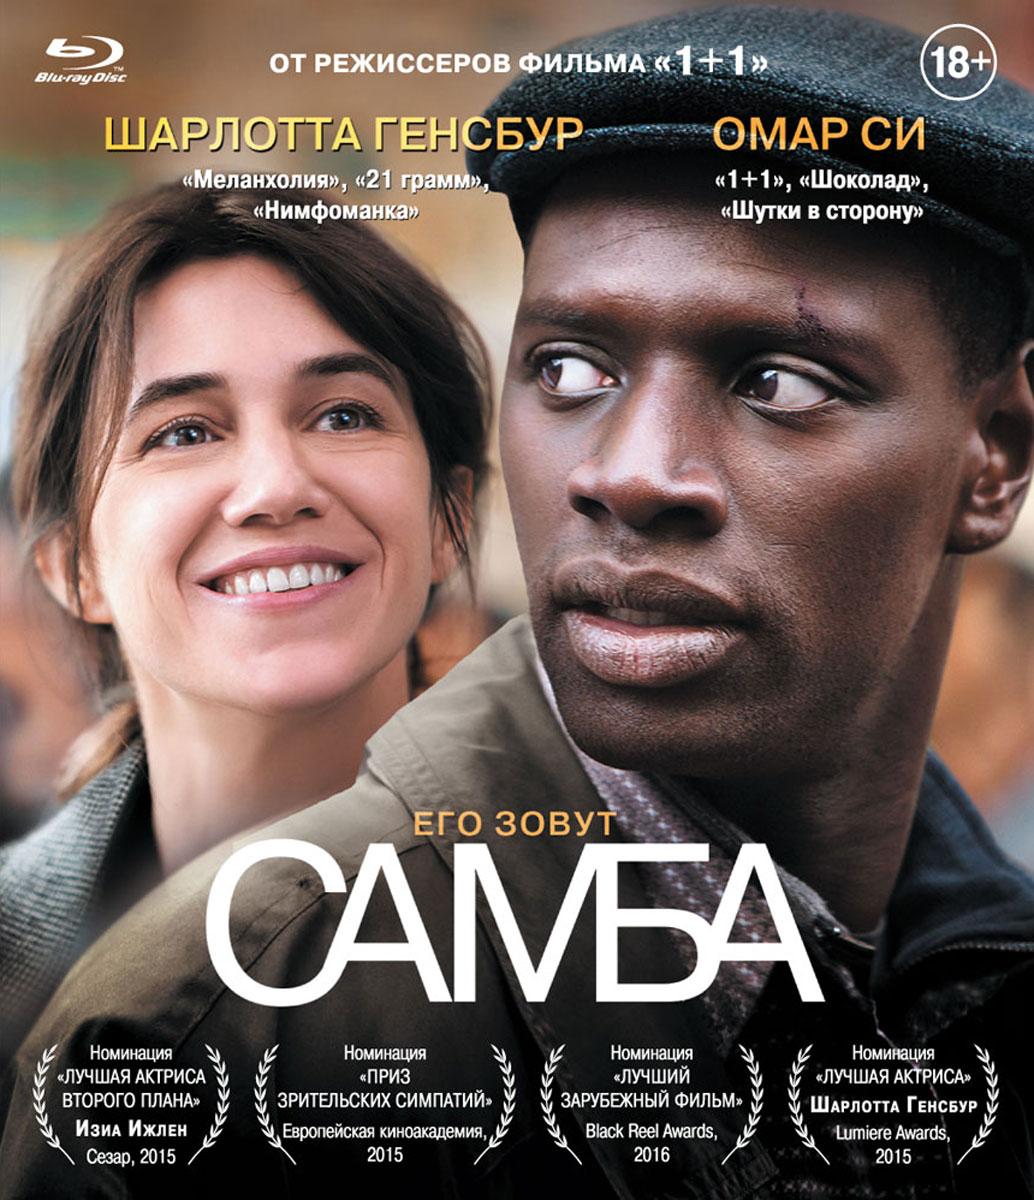 Самба (Blu-ray)